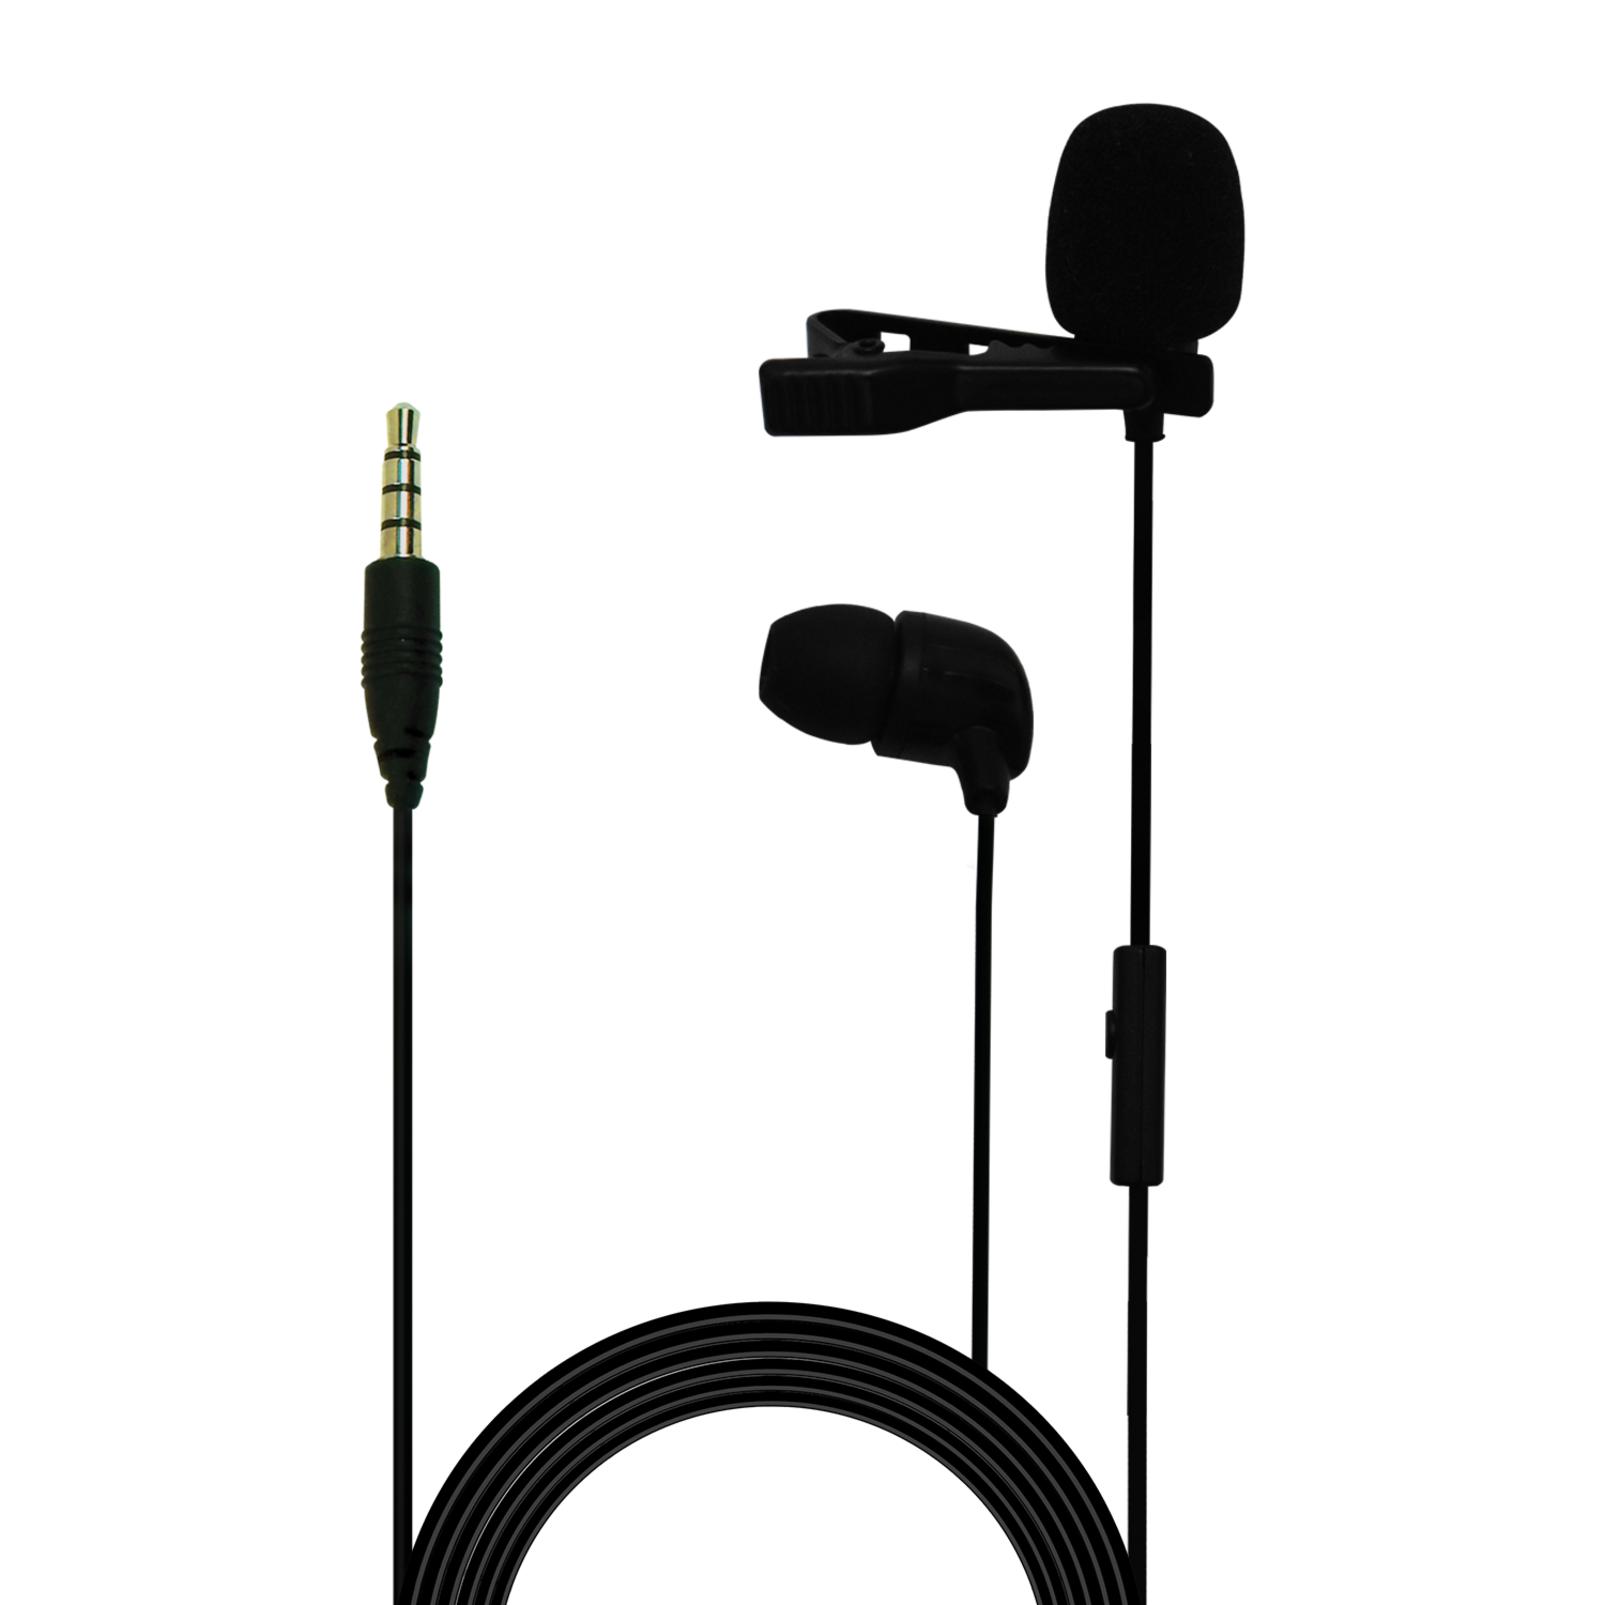 CSLM30 - Black - Clip-on Omnidirectional Lavalier Microphone - Hero